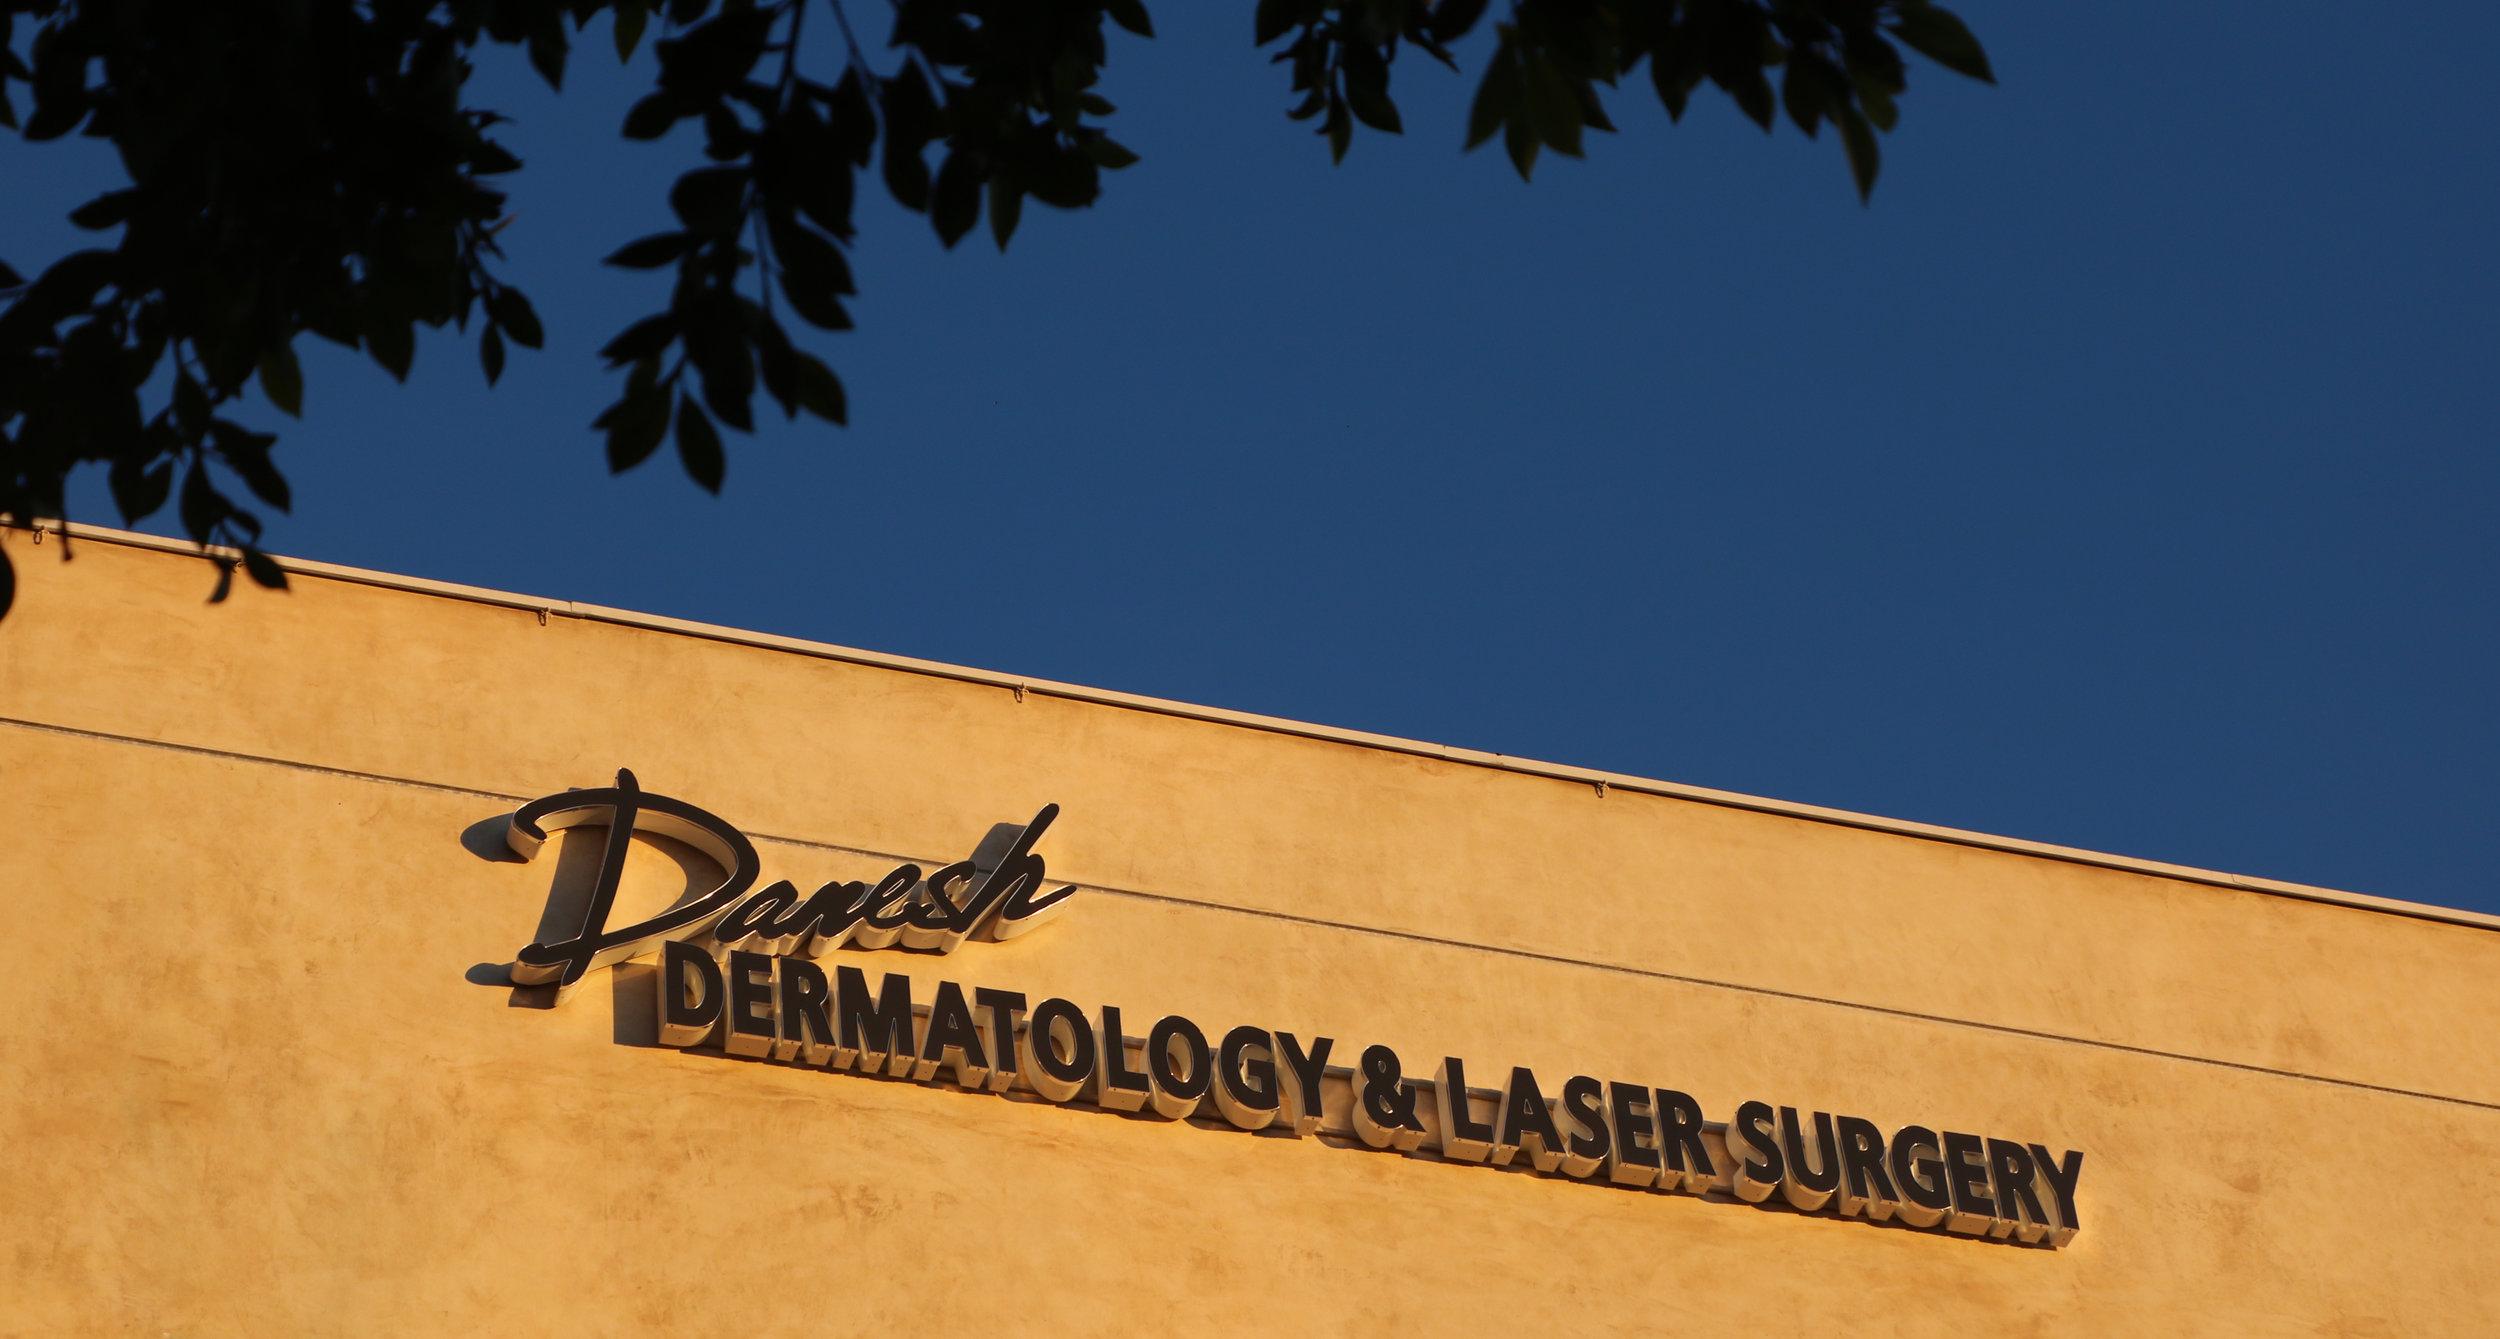 Danesh Dermatology Beverly Hills Sign